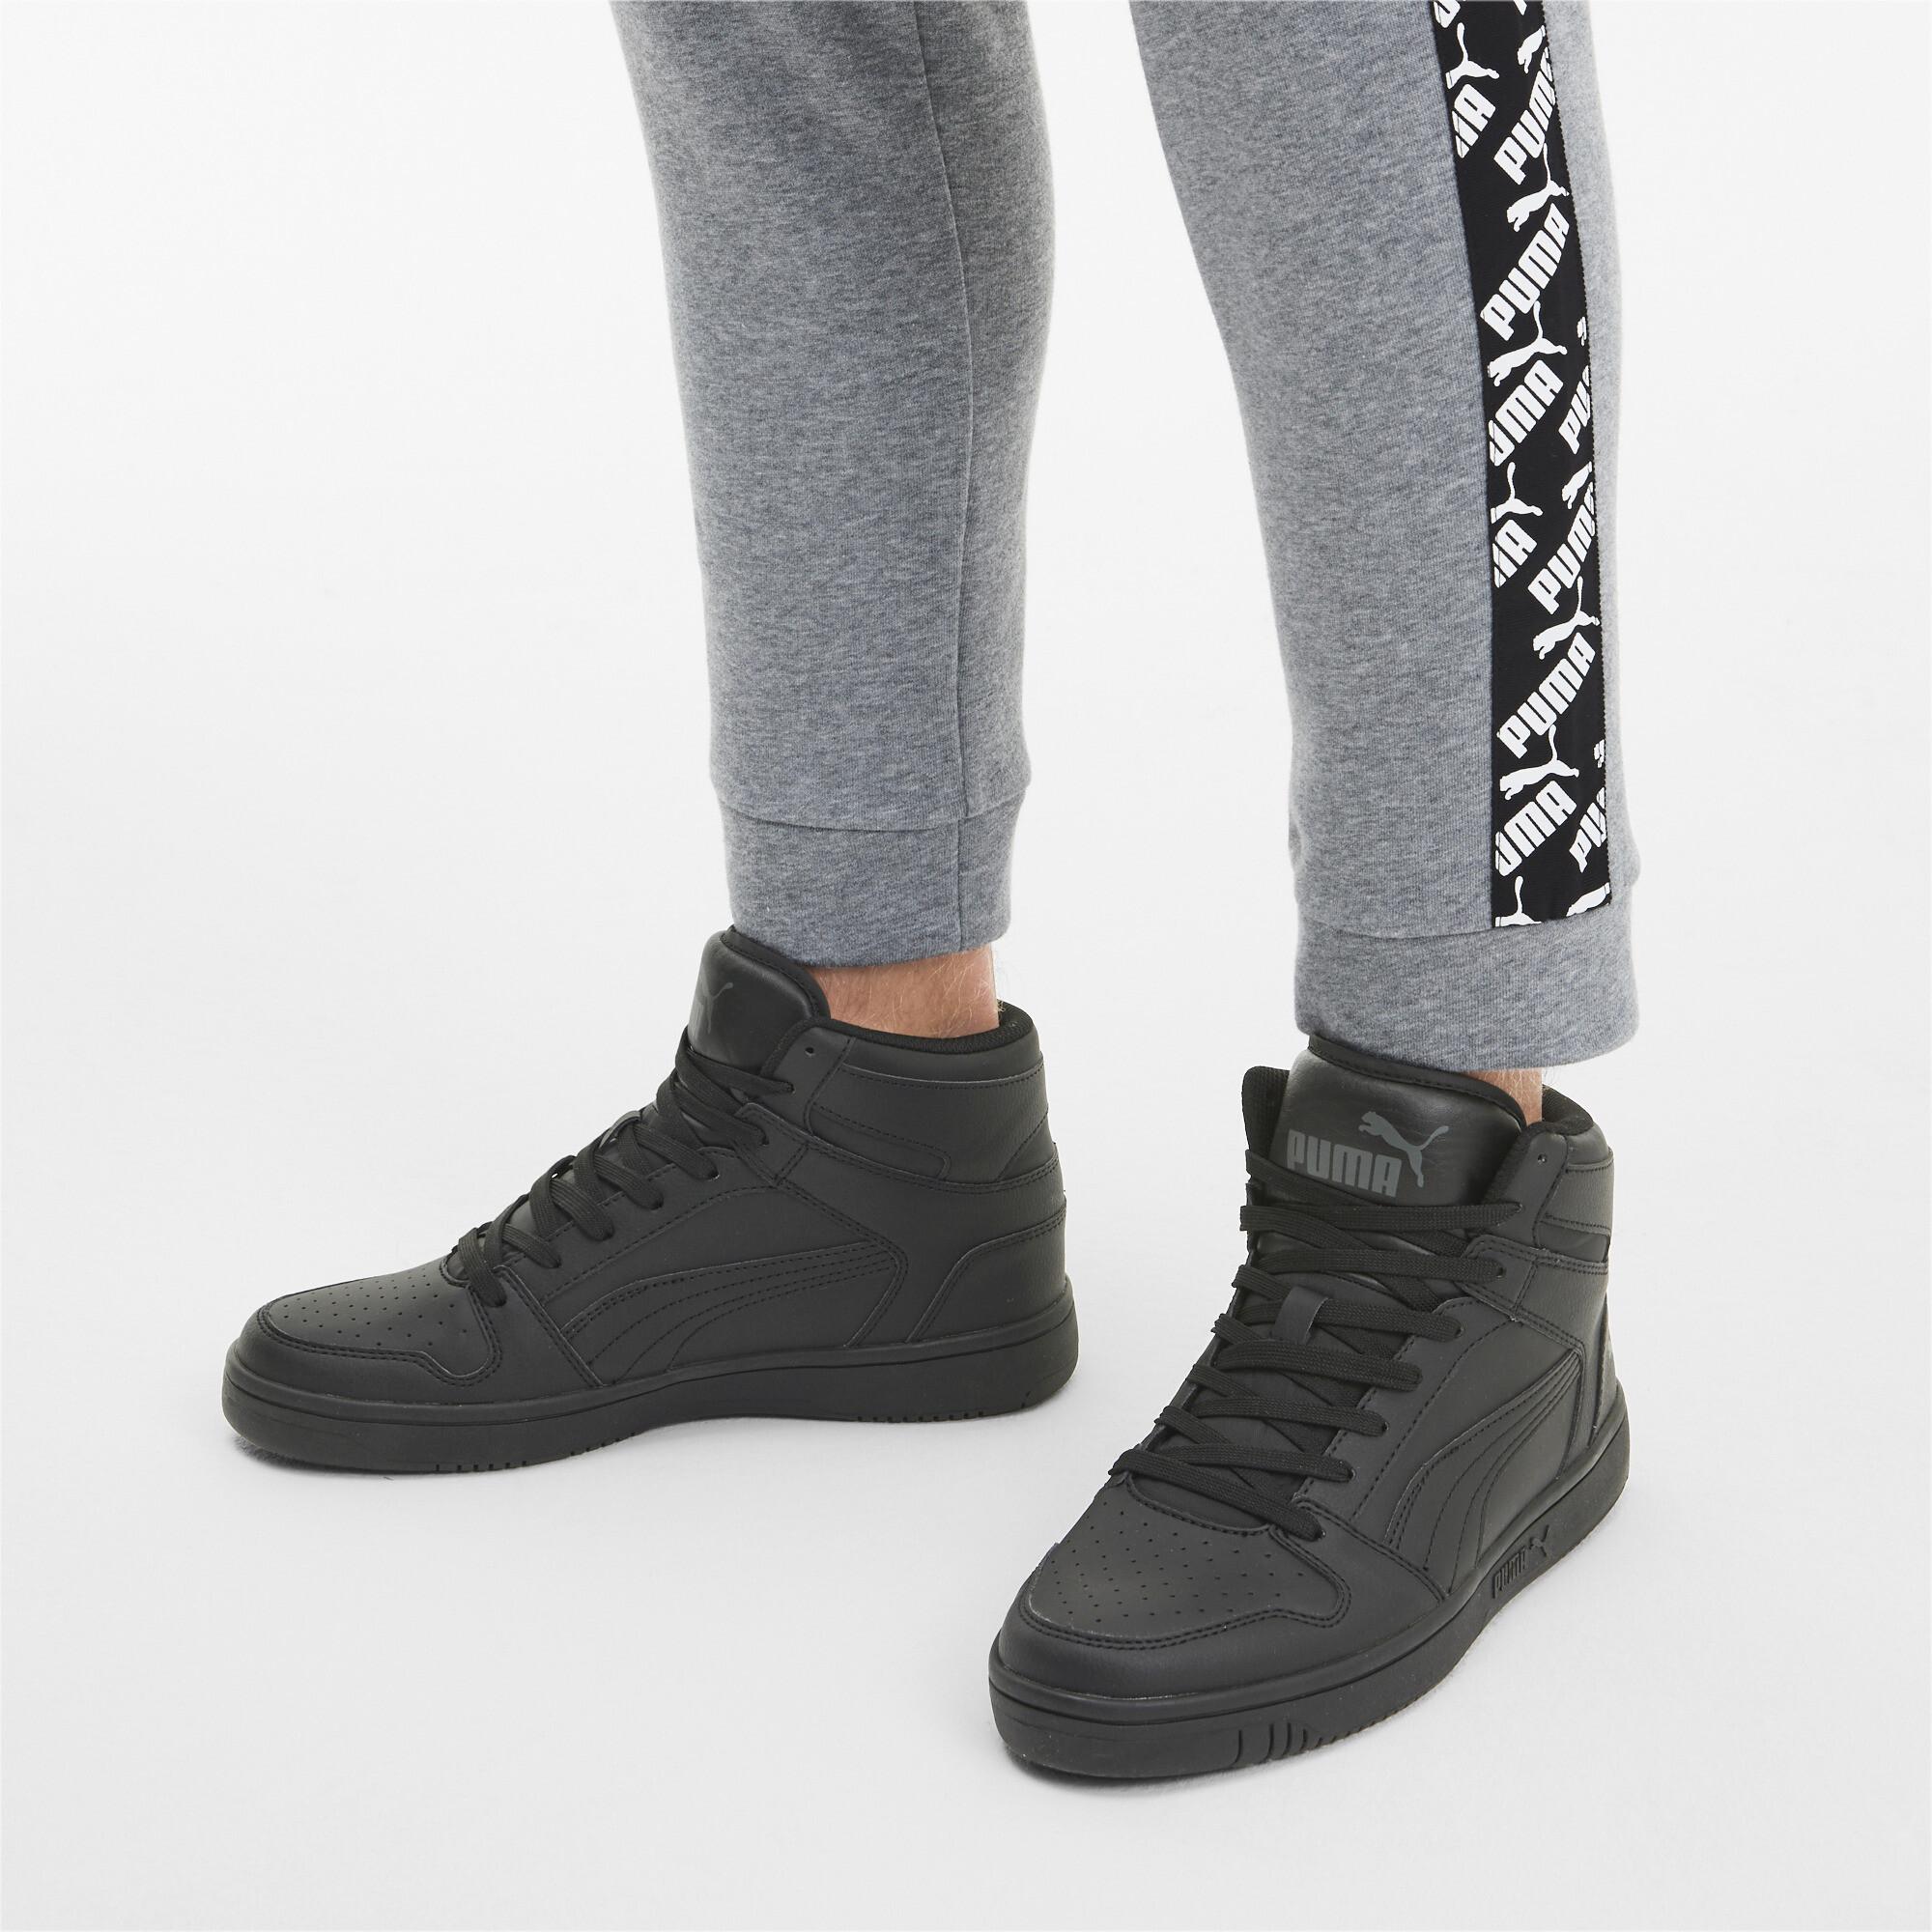 PUMA-PUMA-Rebound-LayUp-Men-039-s-Sneakers-Men-Mid-Boot-Basics thumbnail 24